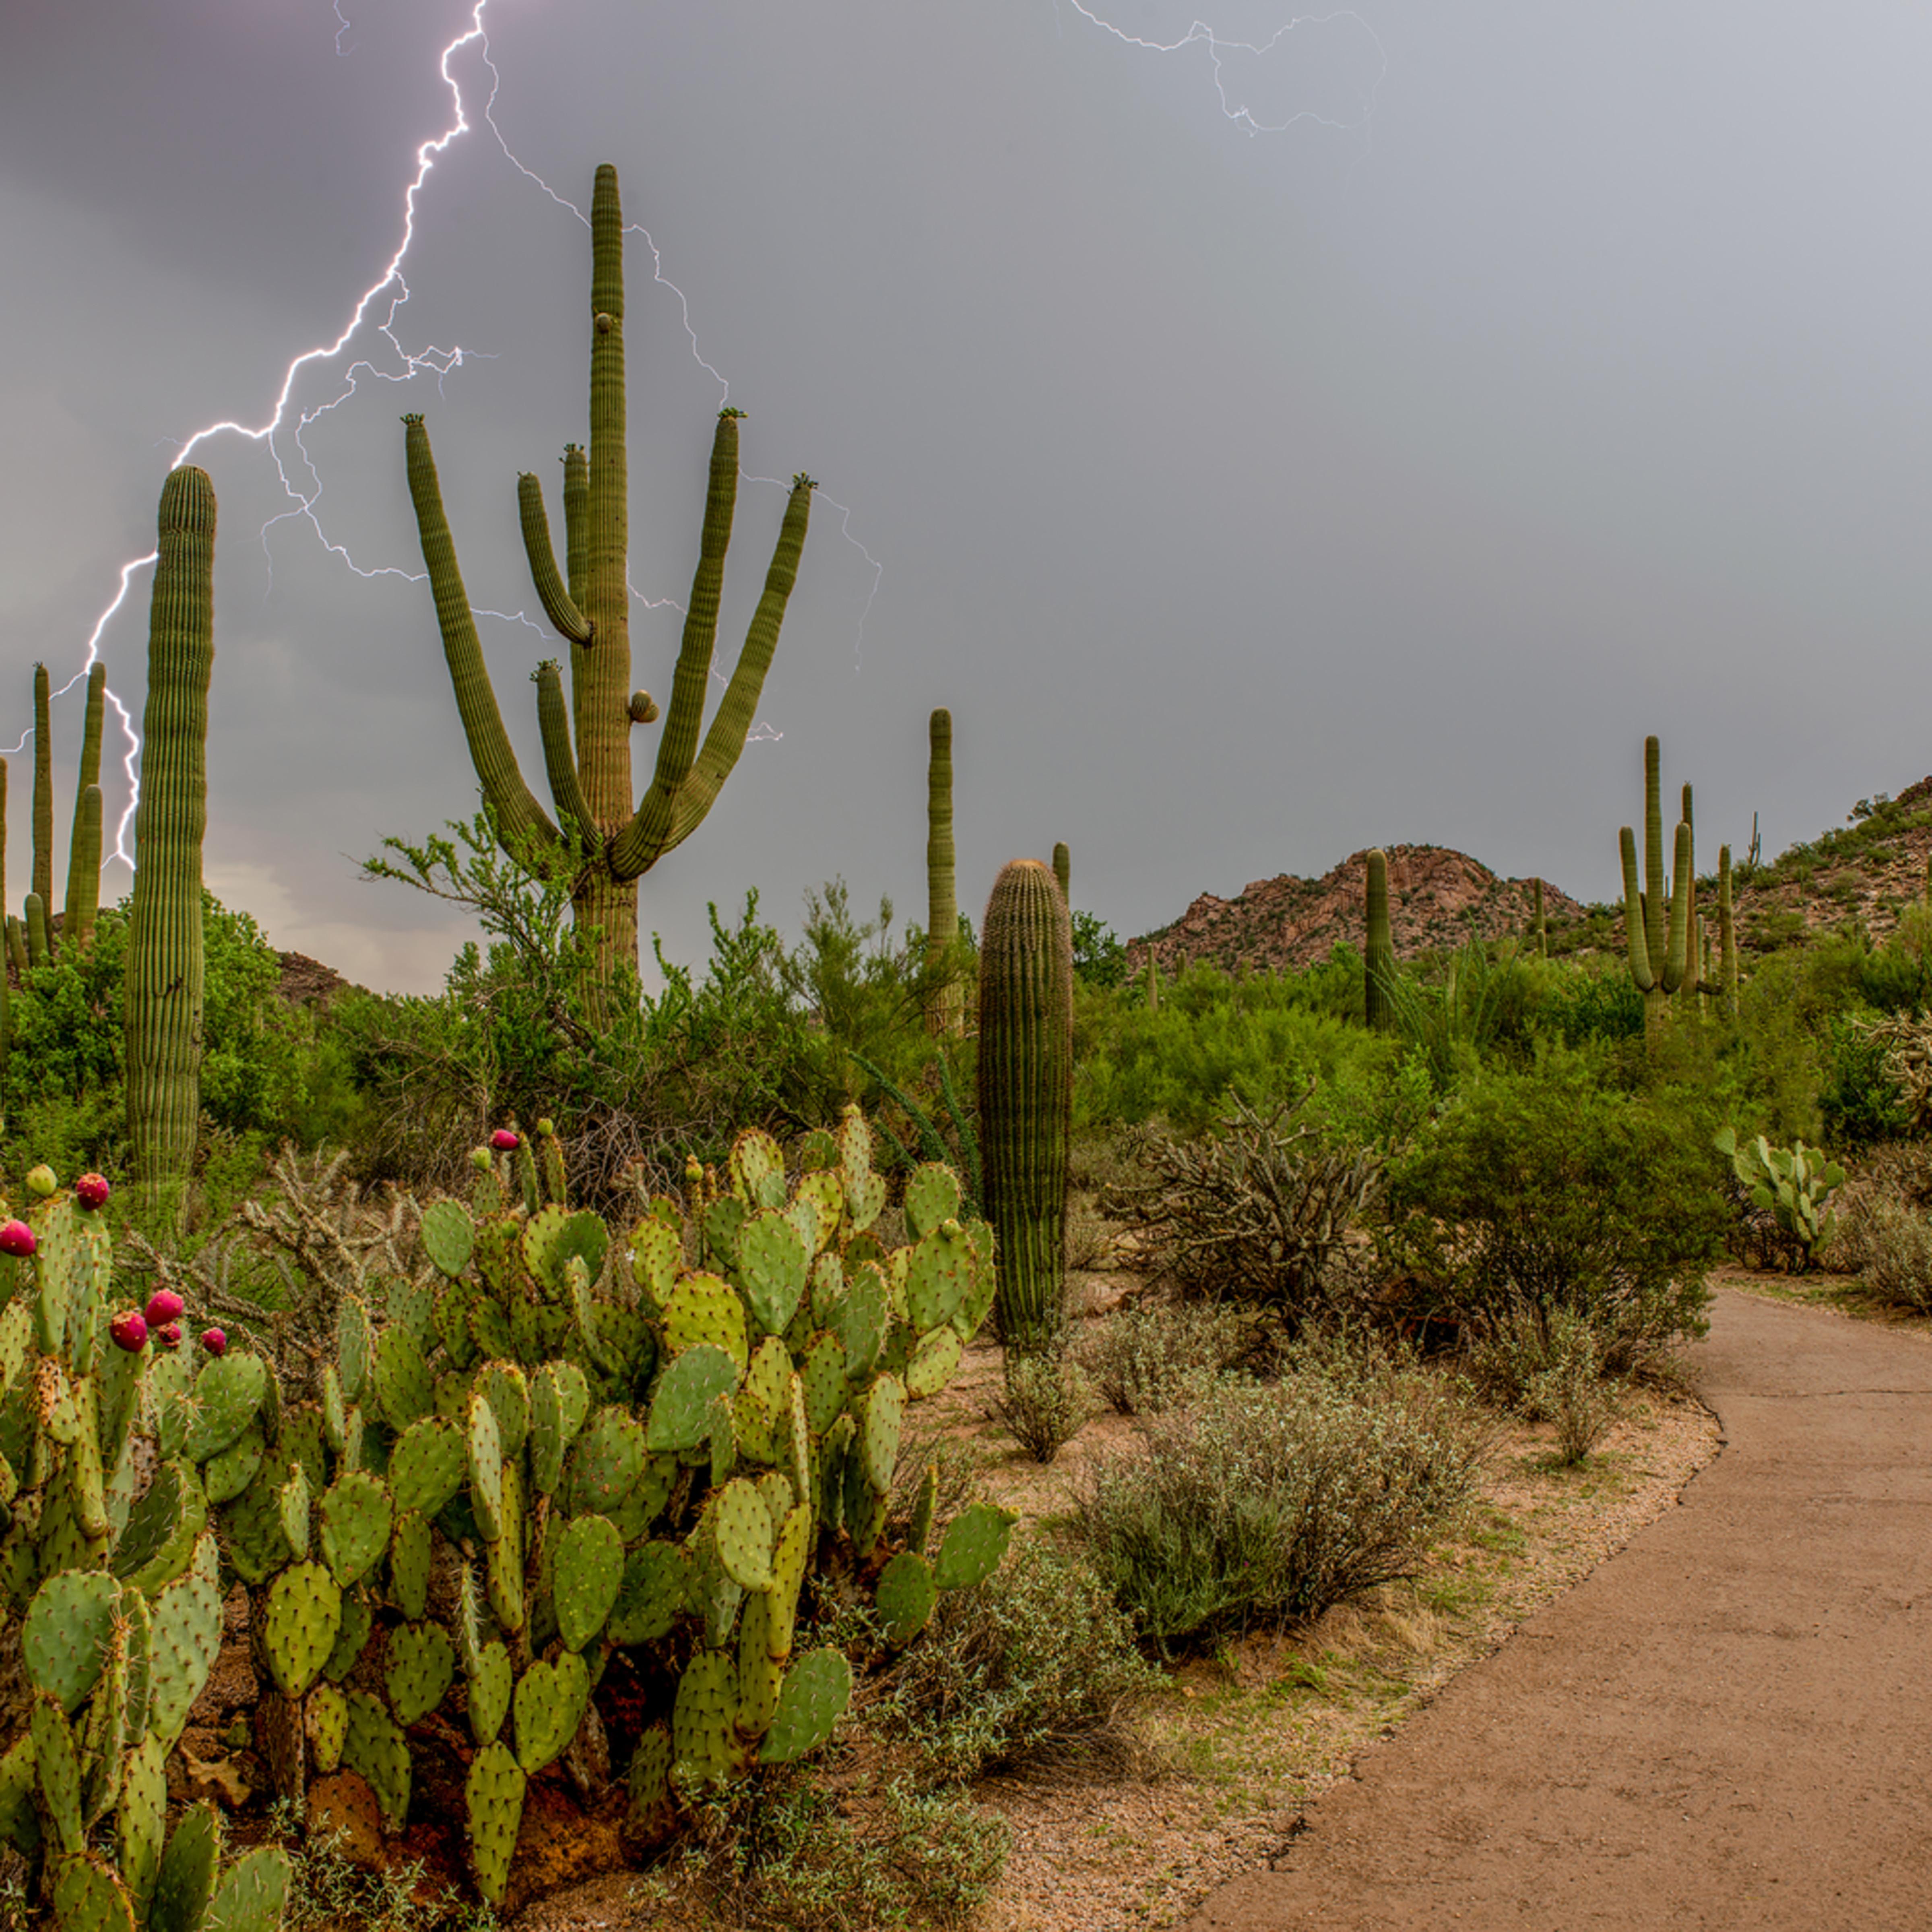 Dp407 monsoon lightning k1jhmx